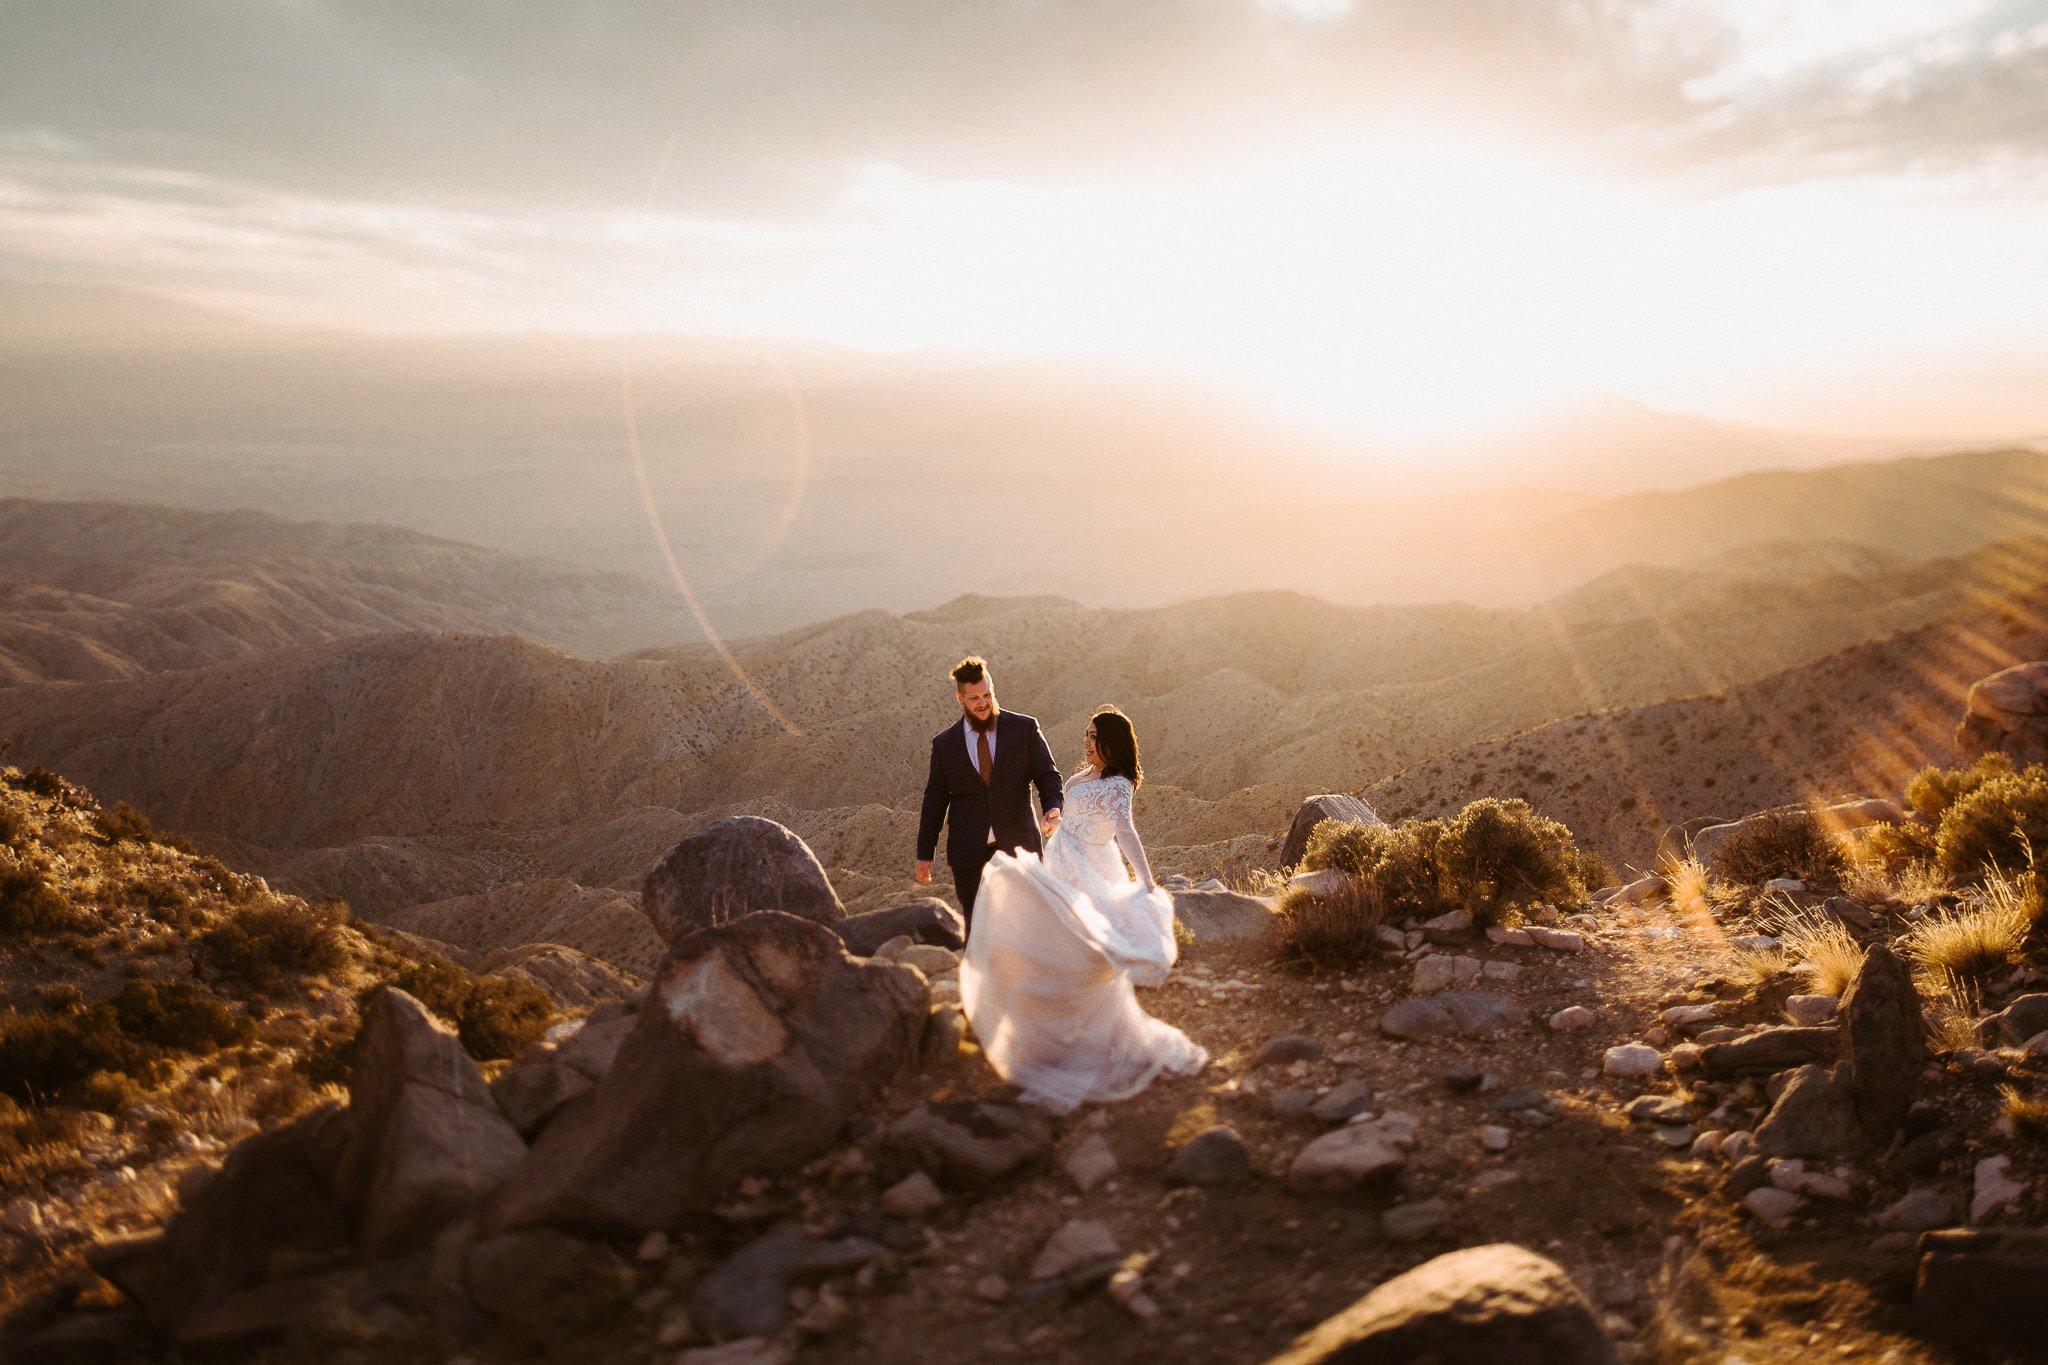 millwick wedding photography 005 1